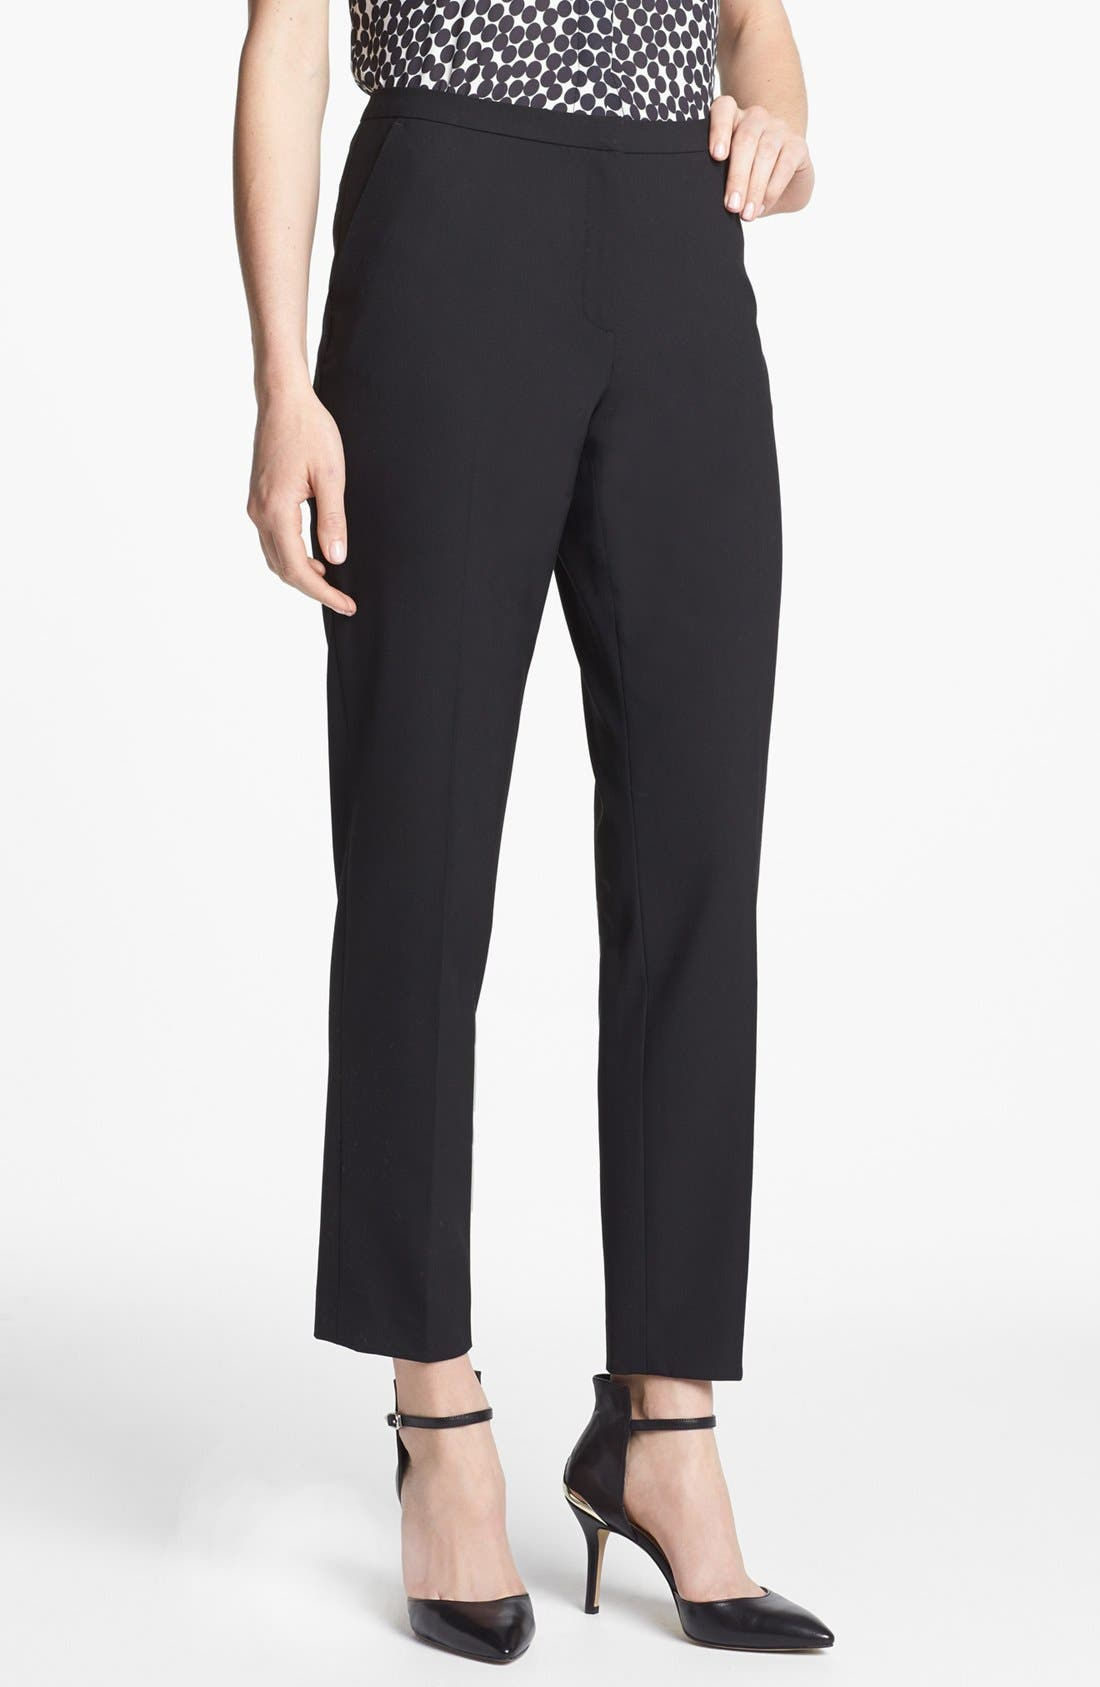 Alternate Image 1 Selected - Halogen® 'Quinn' Skinny Ankle Pants (Regular & Petite)